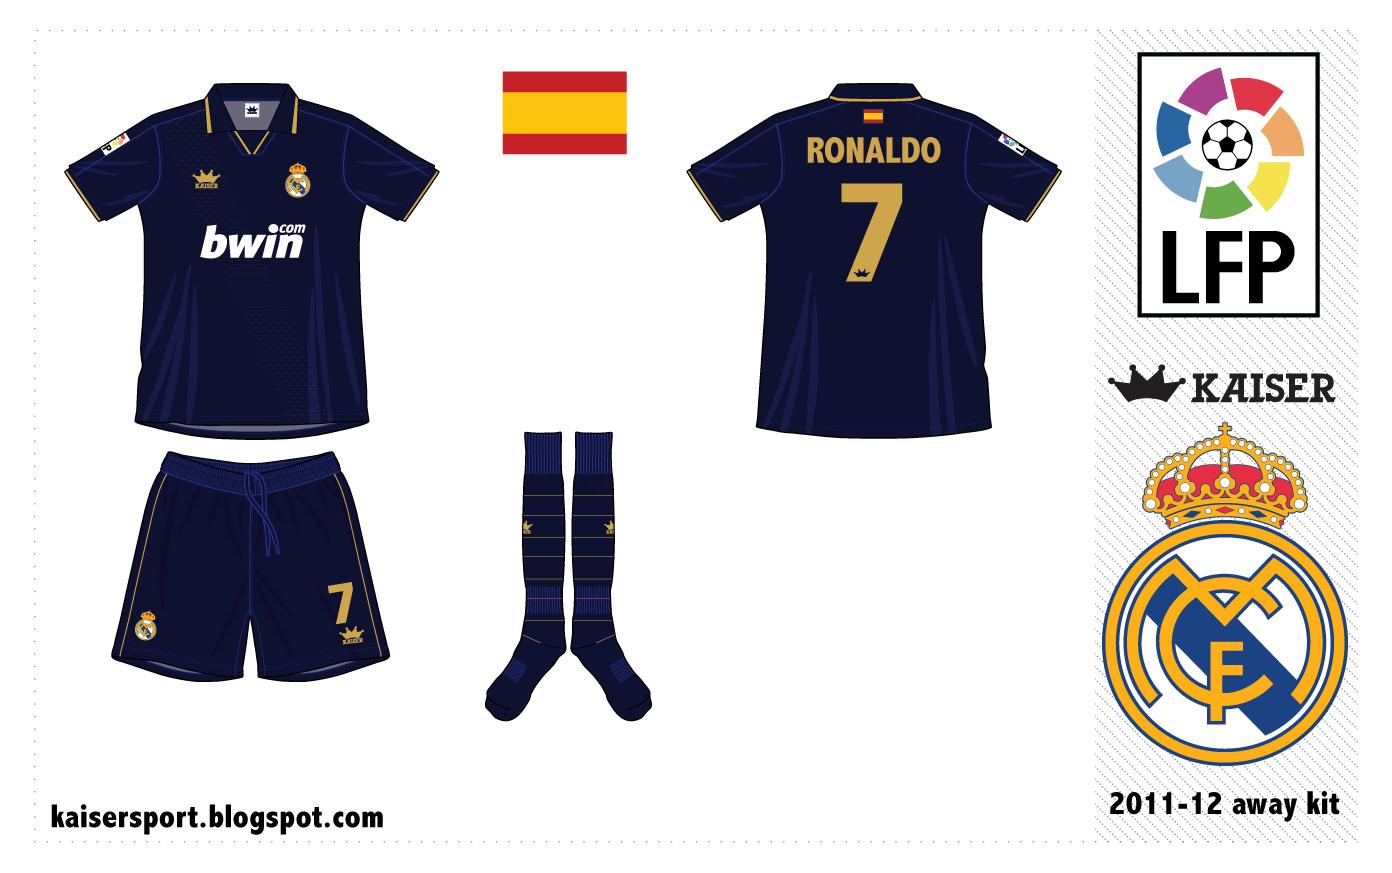 Kaiser Sport: Real Madrid Fantasy Kits